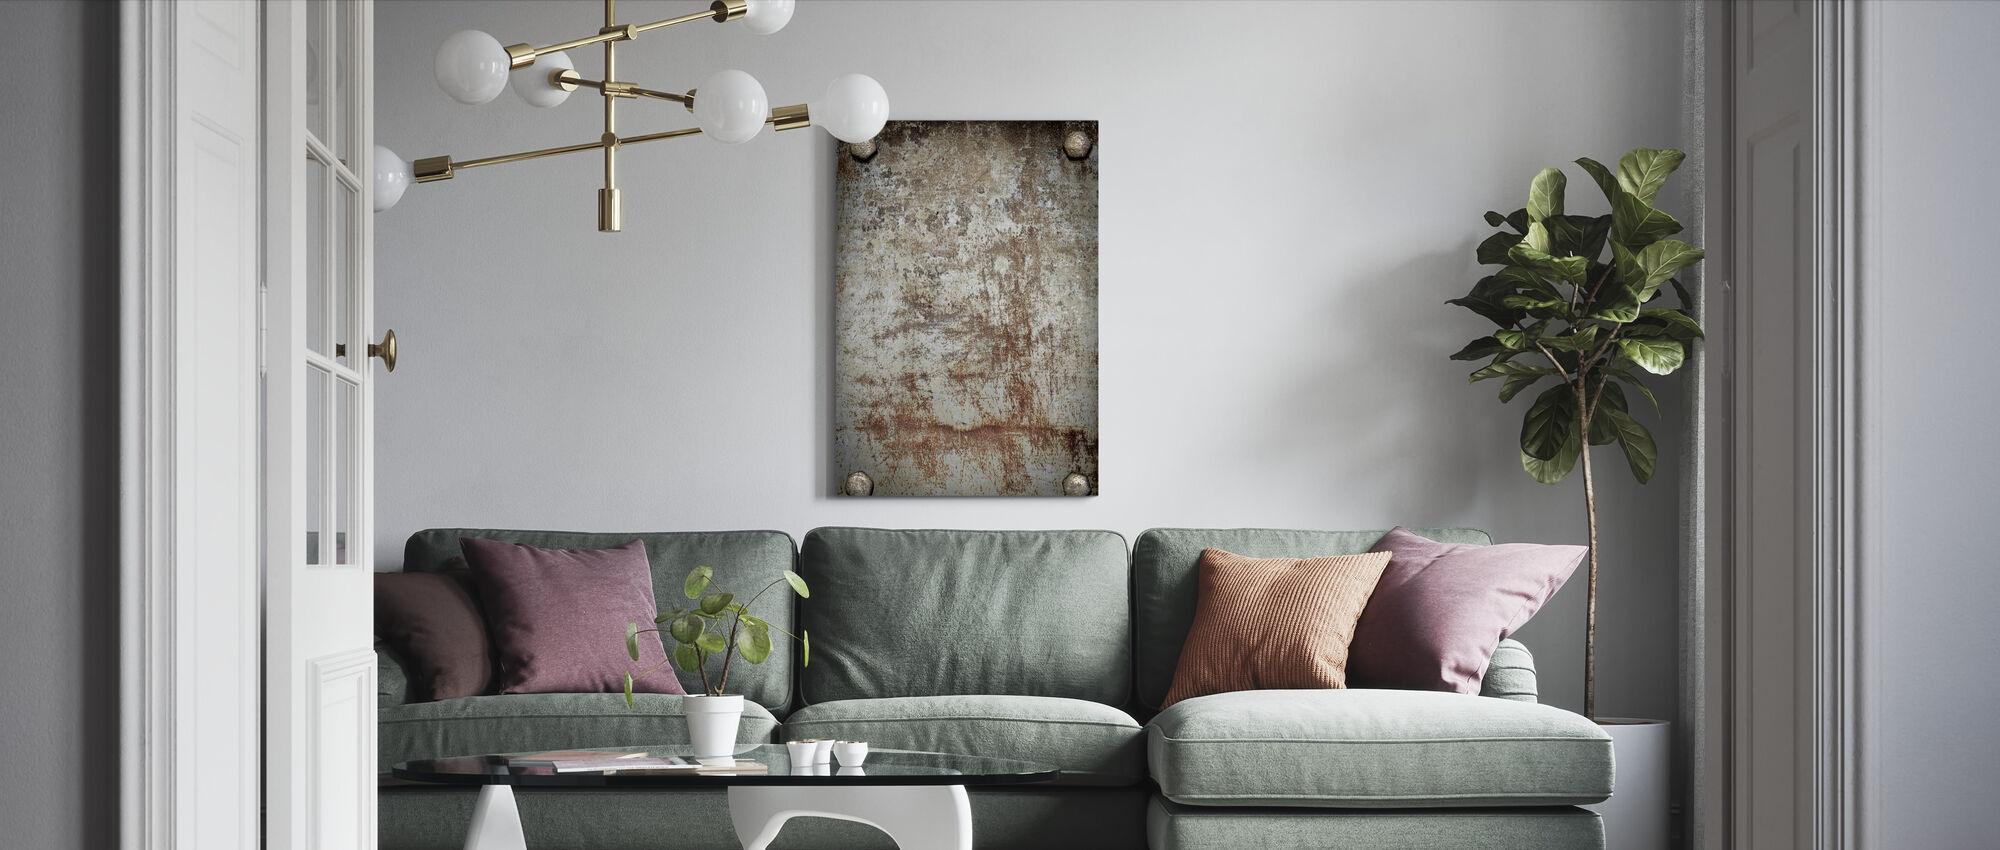 Gebouten stalen plaat - Canvas print - Woonkamer